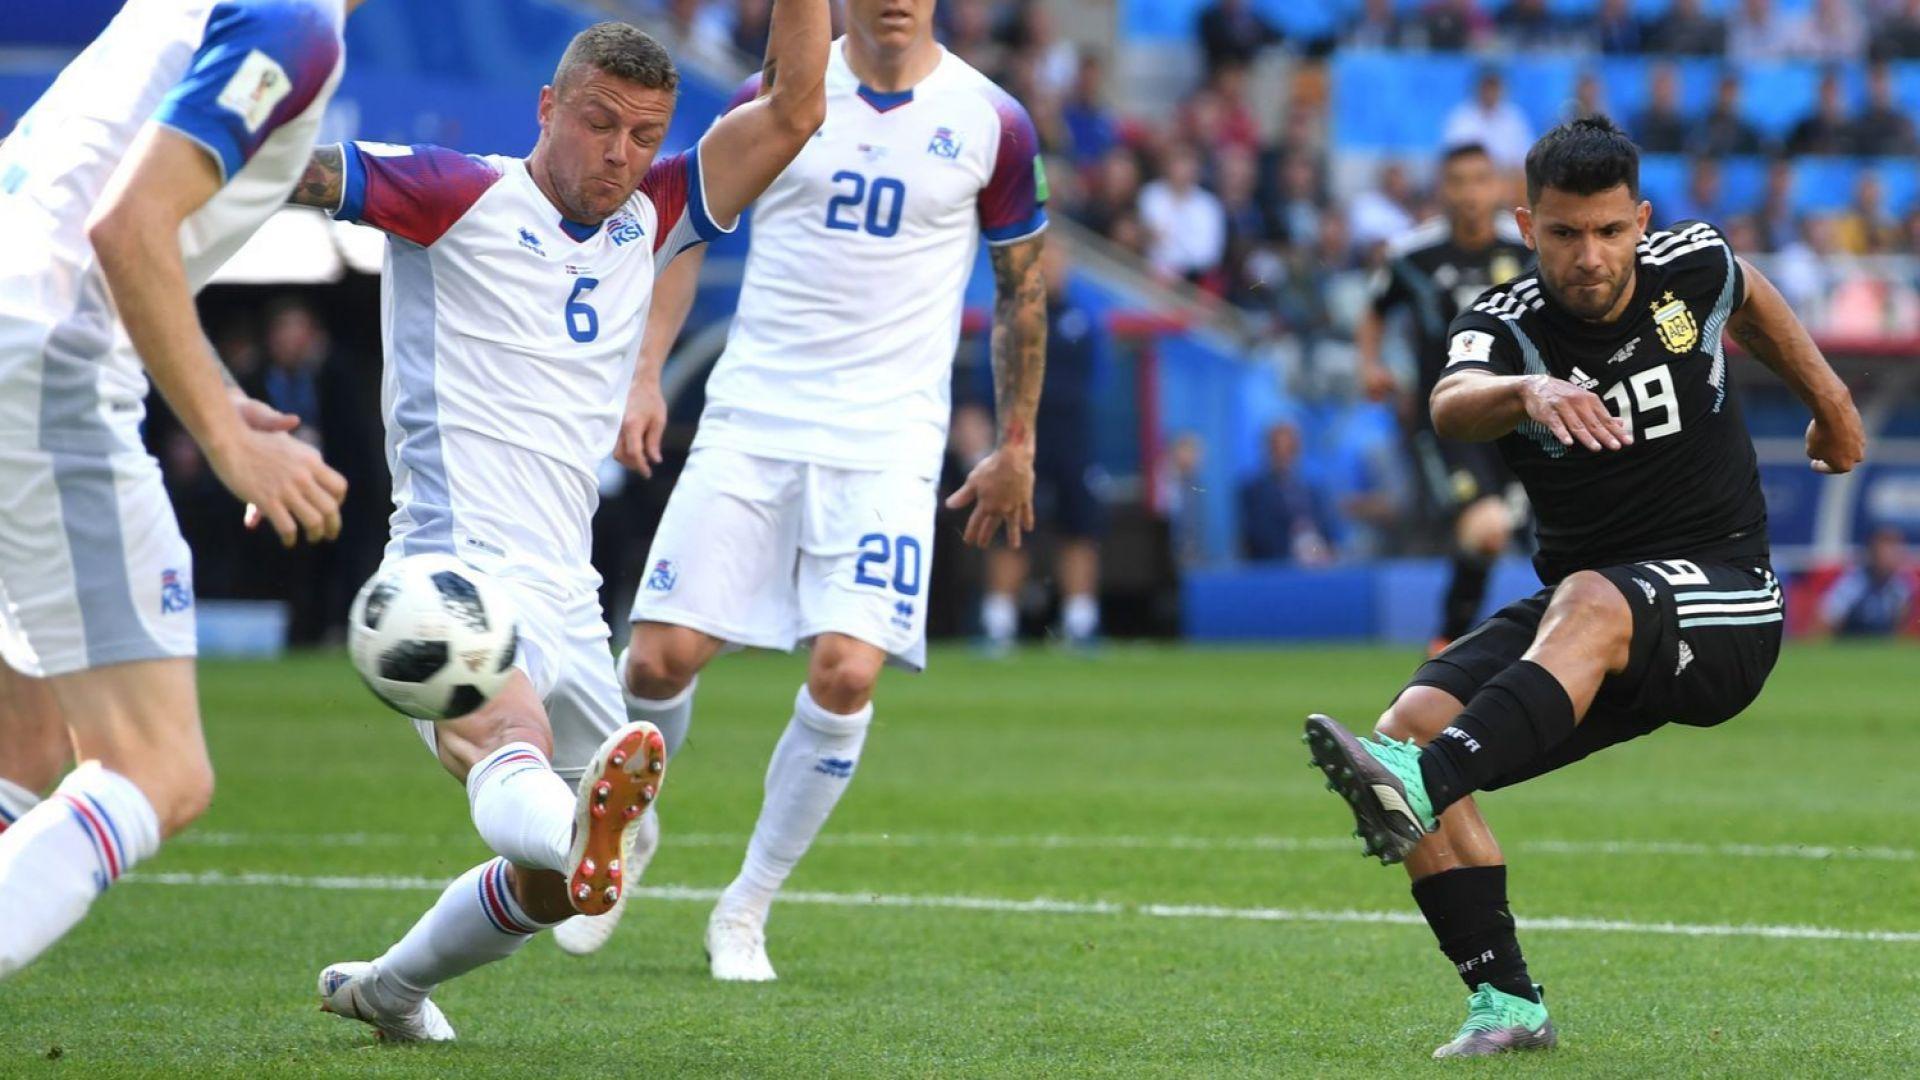 Аржентина - Исландия 1:1 (статистики)